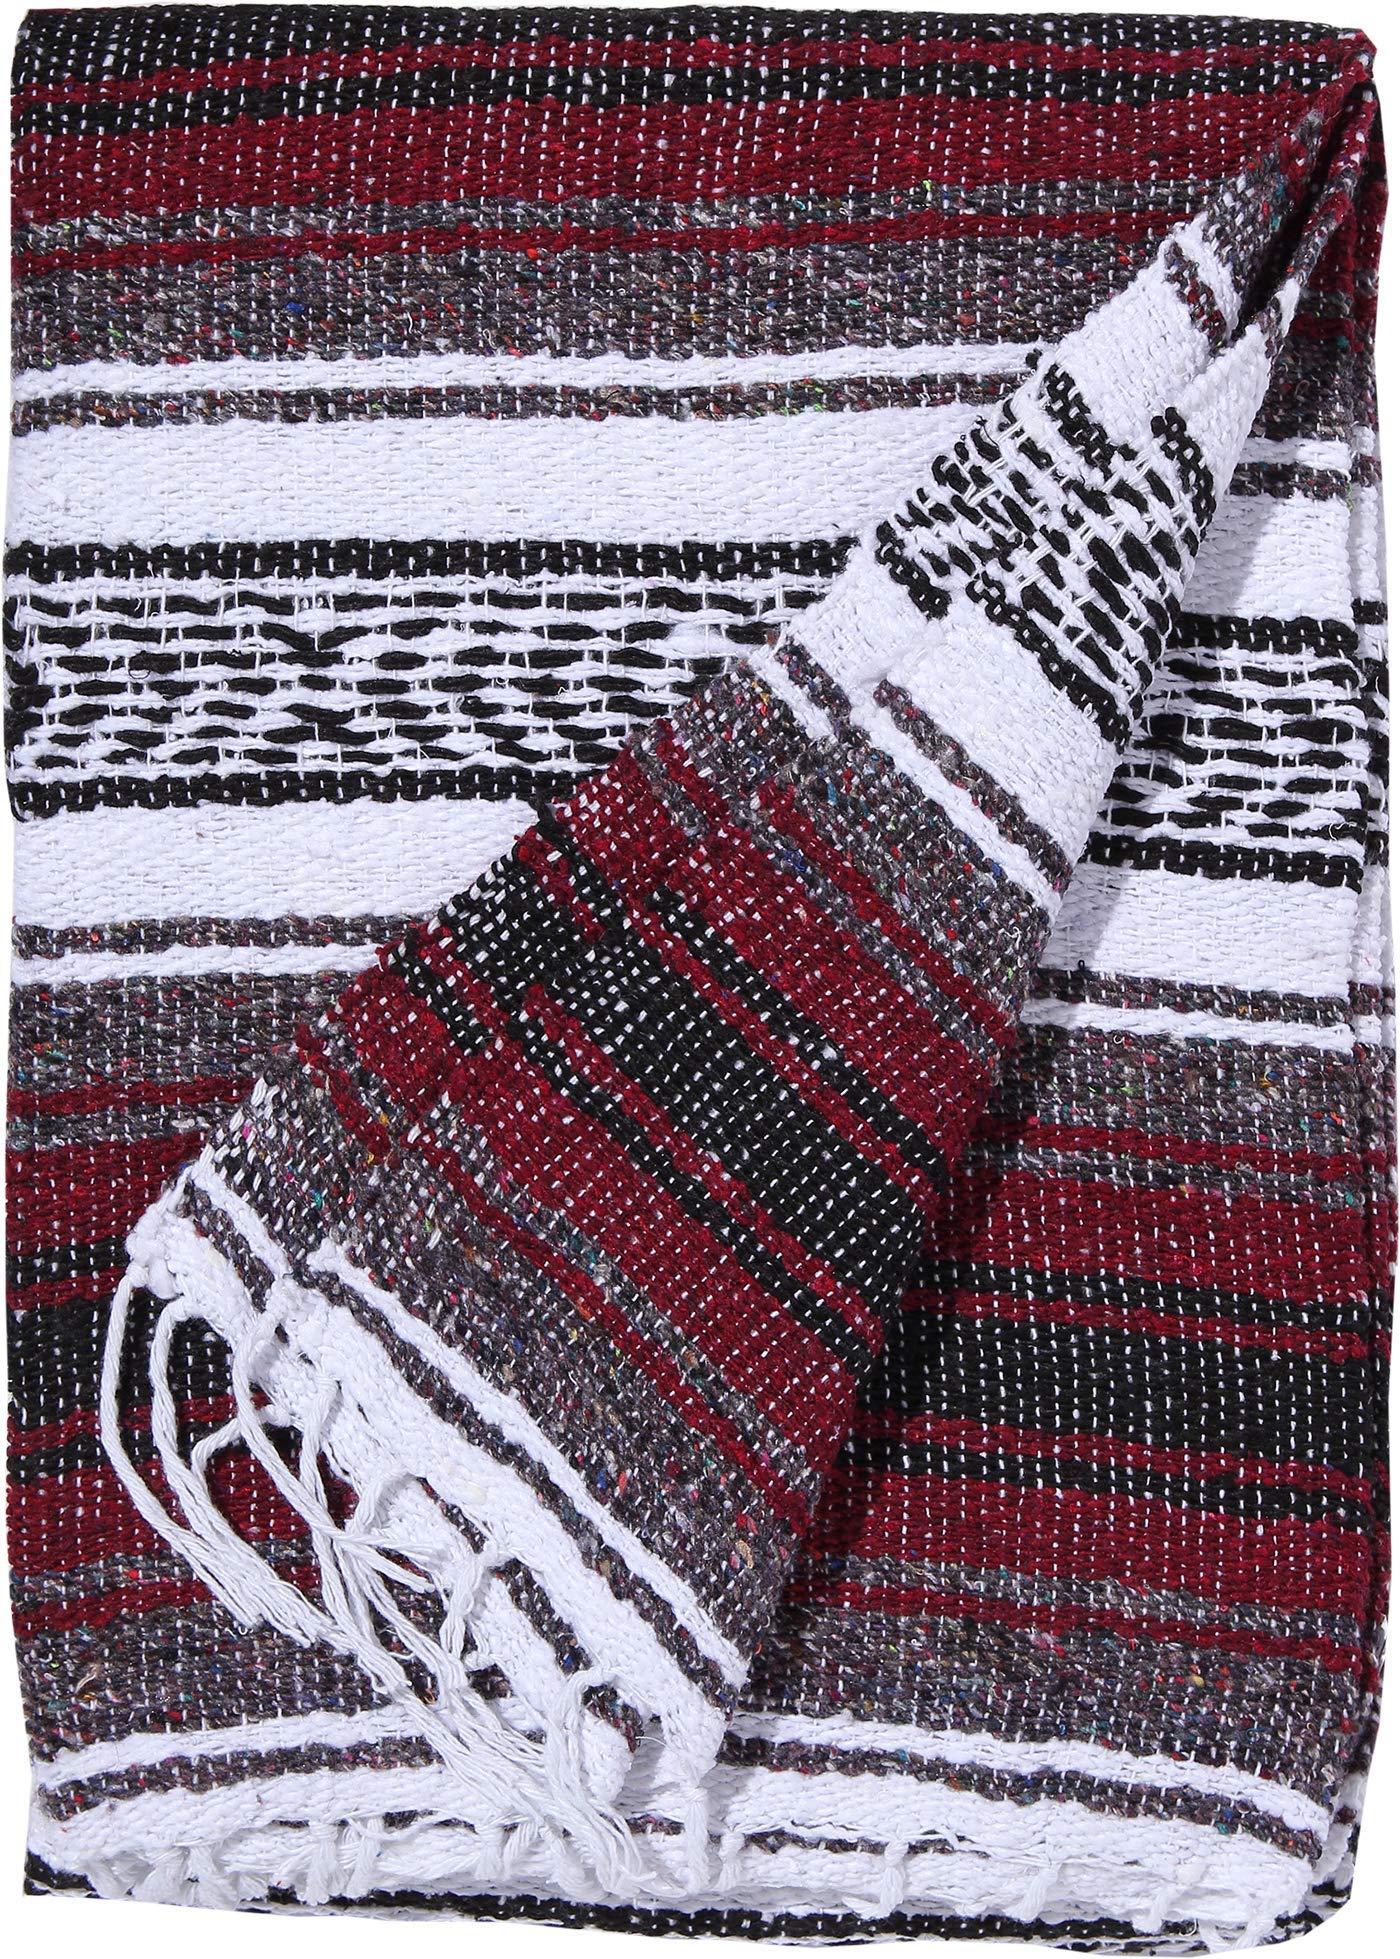 El Paso Designs Genuine Mexican Falsa Blanket - Yoga Studio Blanket, Colorful, Soft Woven Serape Imported from Mexico (Burgundy) by El Paso Designs (Image #2)